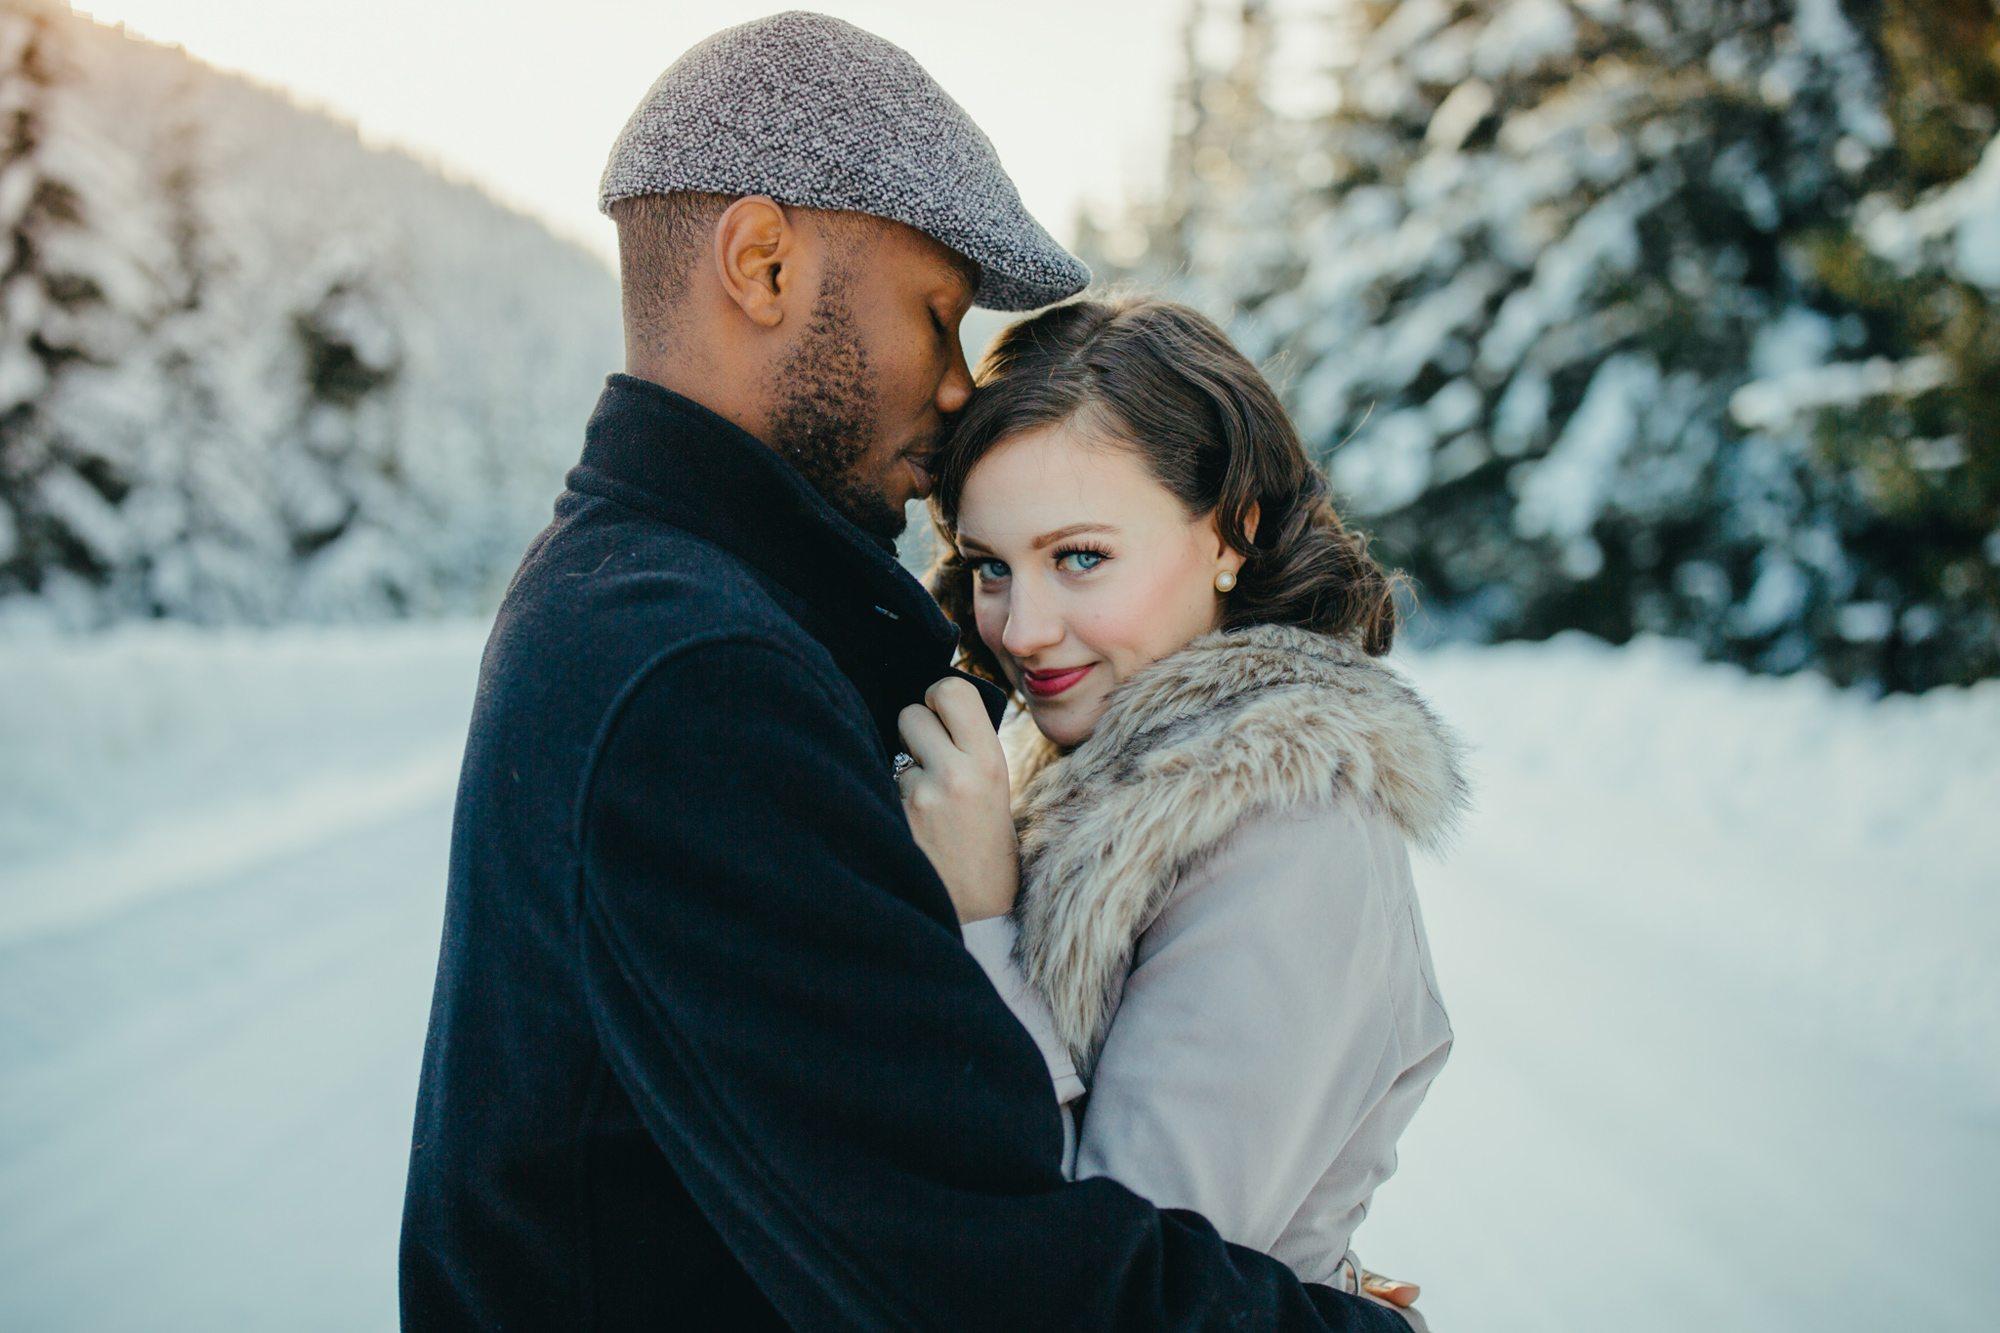 007-adventure-engagement-photographer